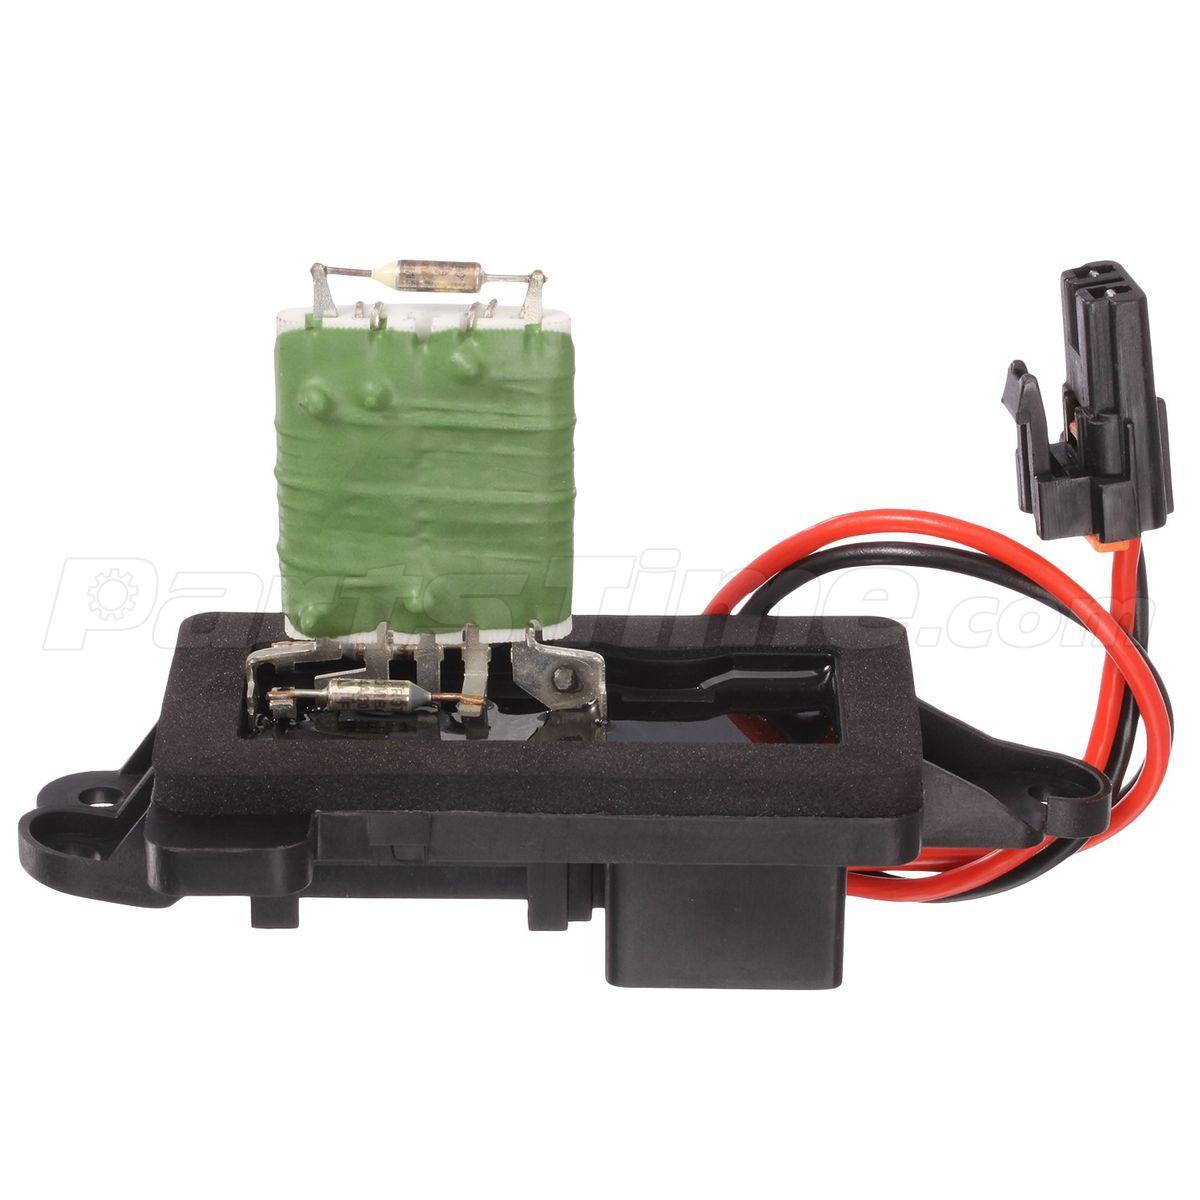 125574 6 blower motor resistor wiring harness blower motor resistor w cbt1c110 blower motor wiring harness at honlapkeszites.co